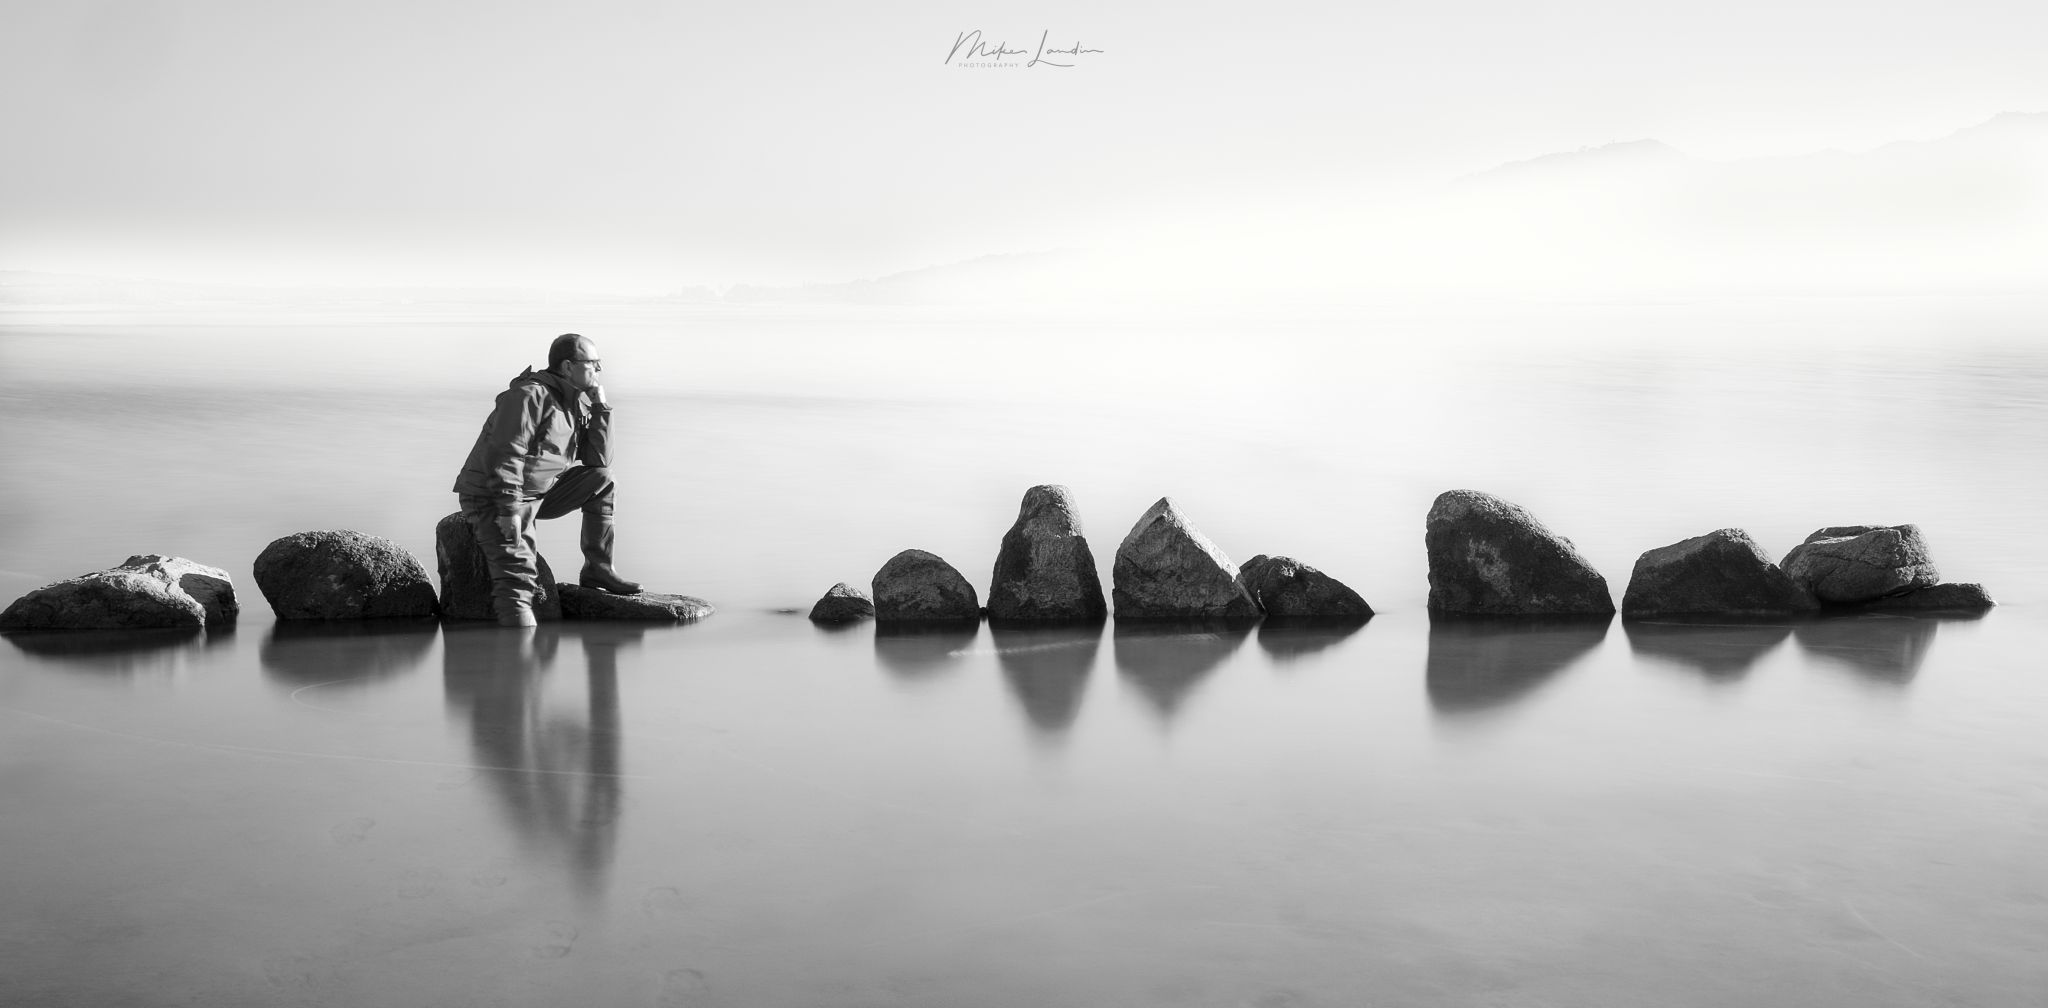 Self Portrait, Spain